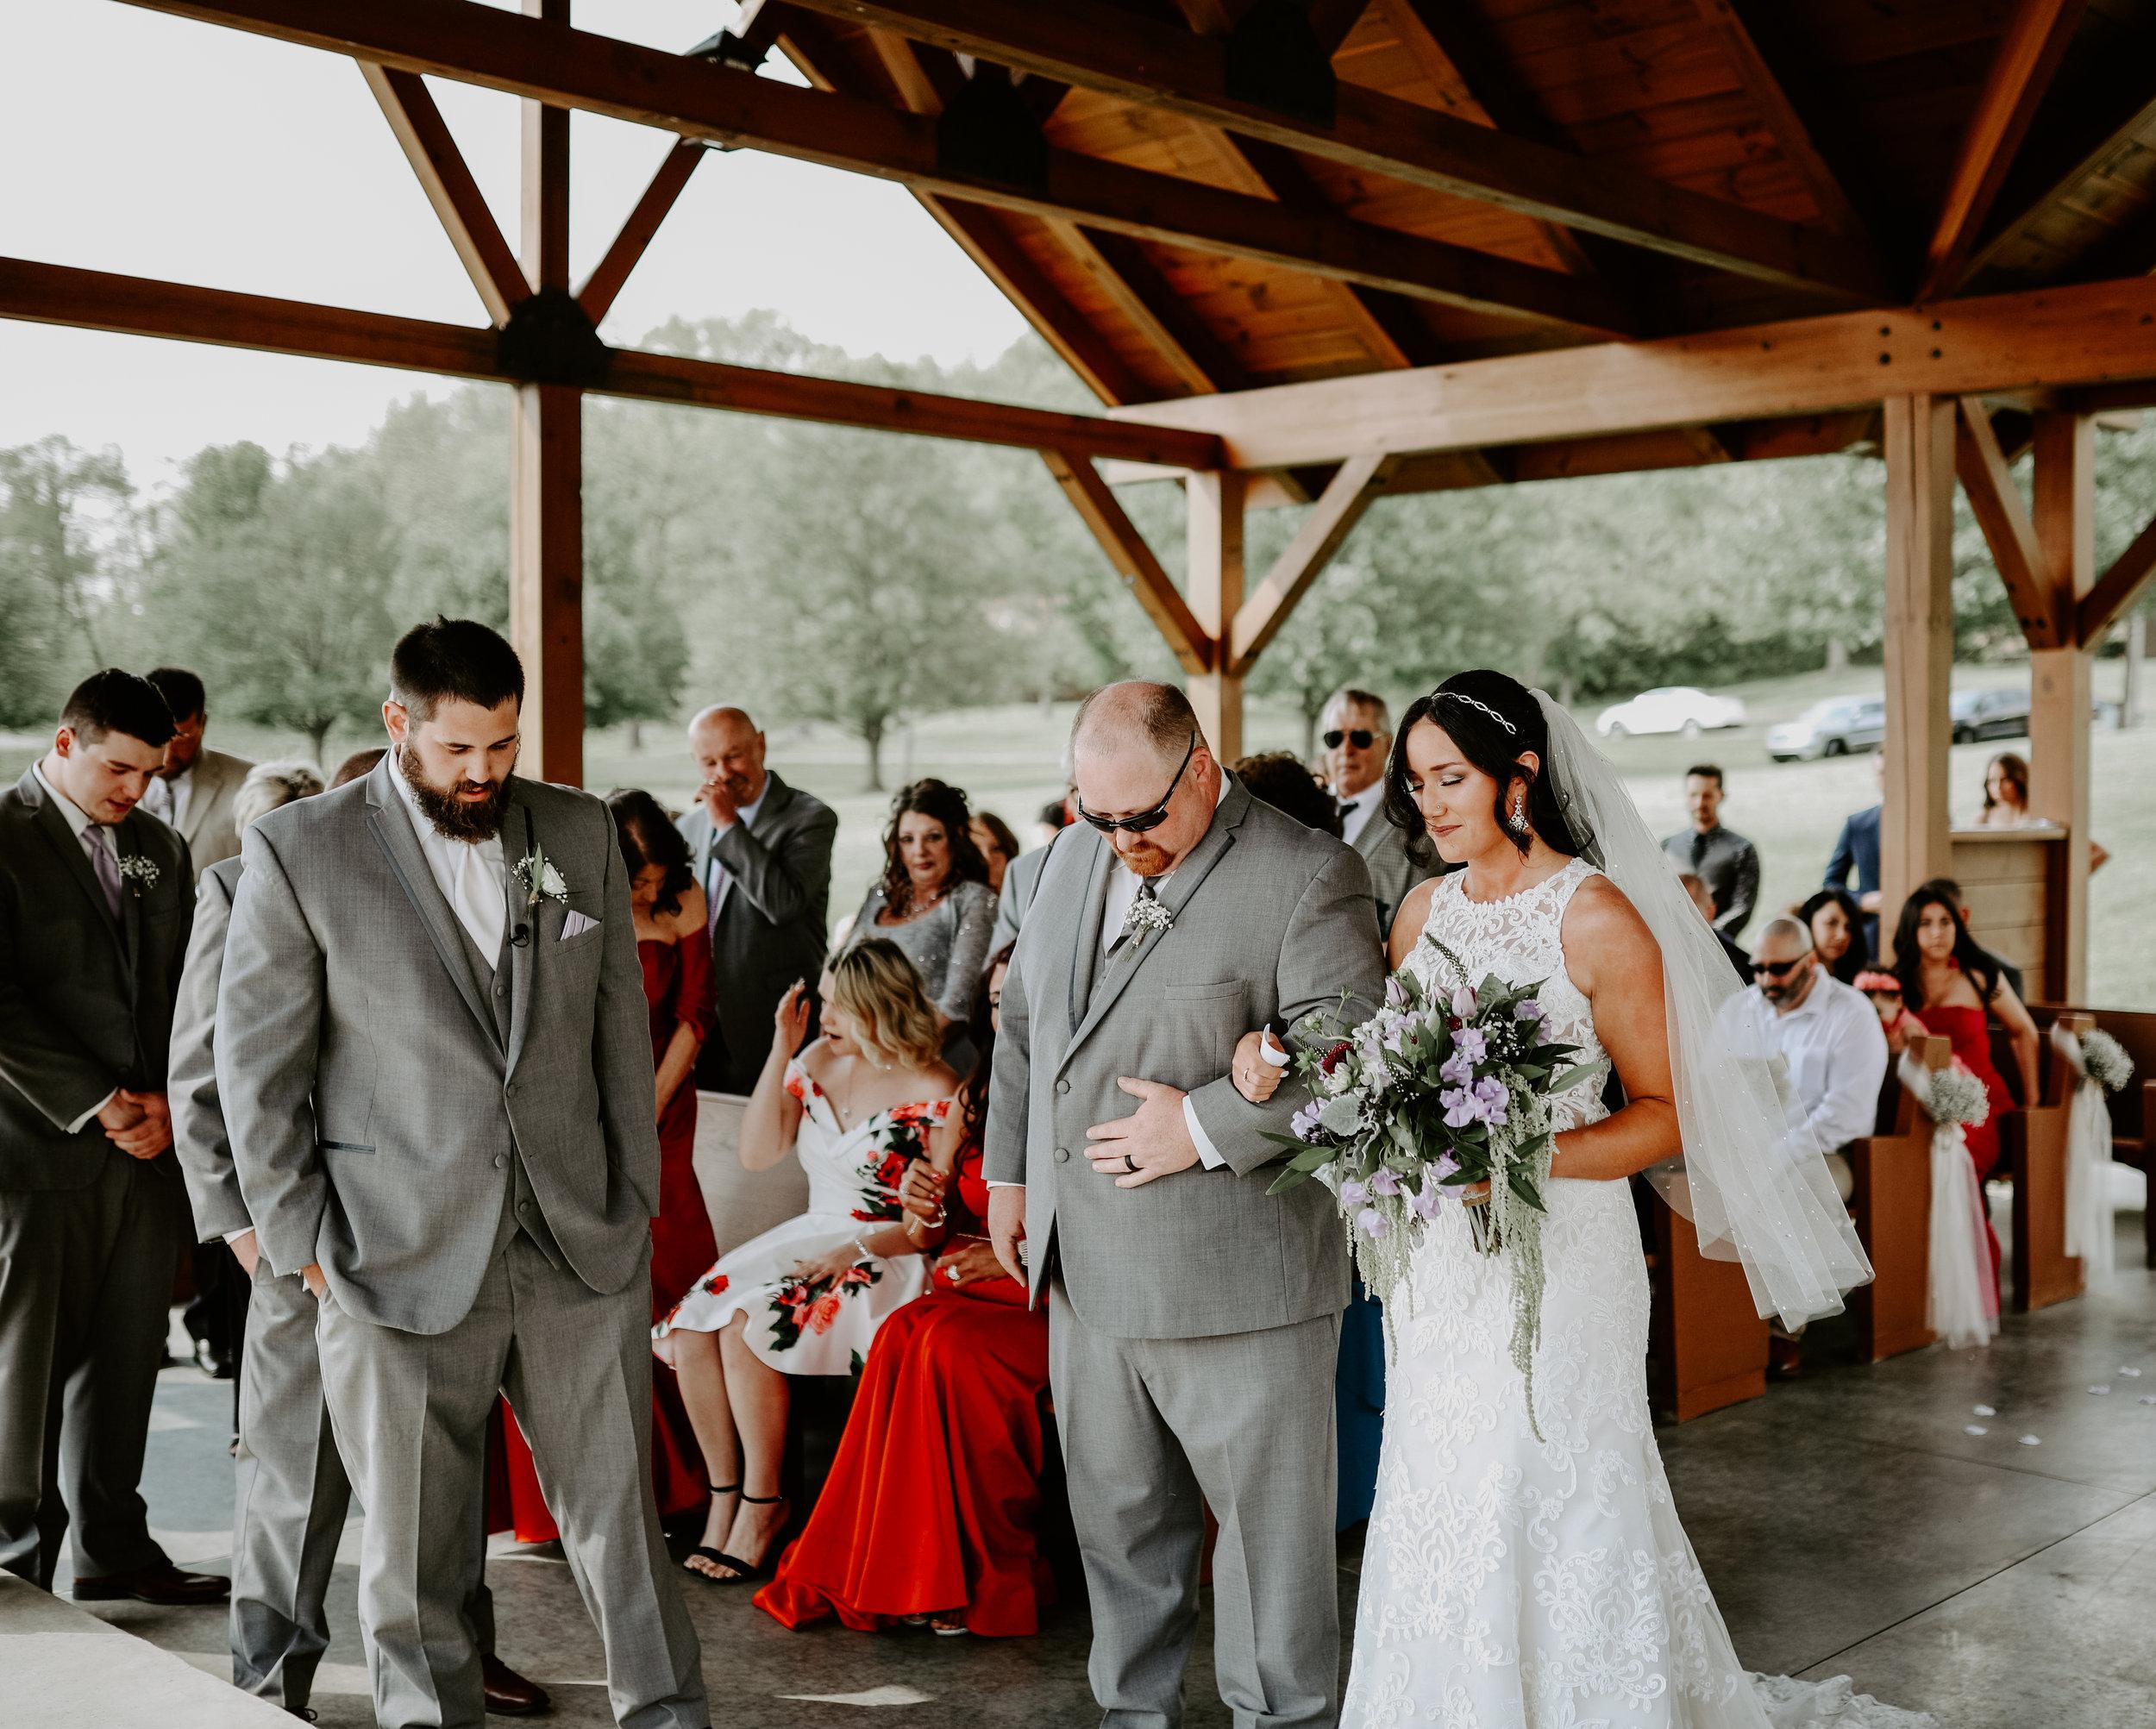 Kylei + Jordan Wedding 9 (1 of 1).jpg